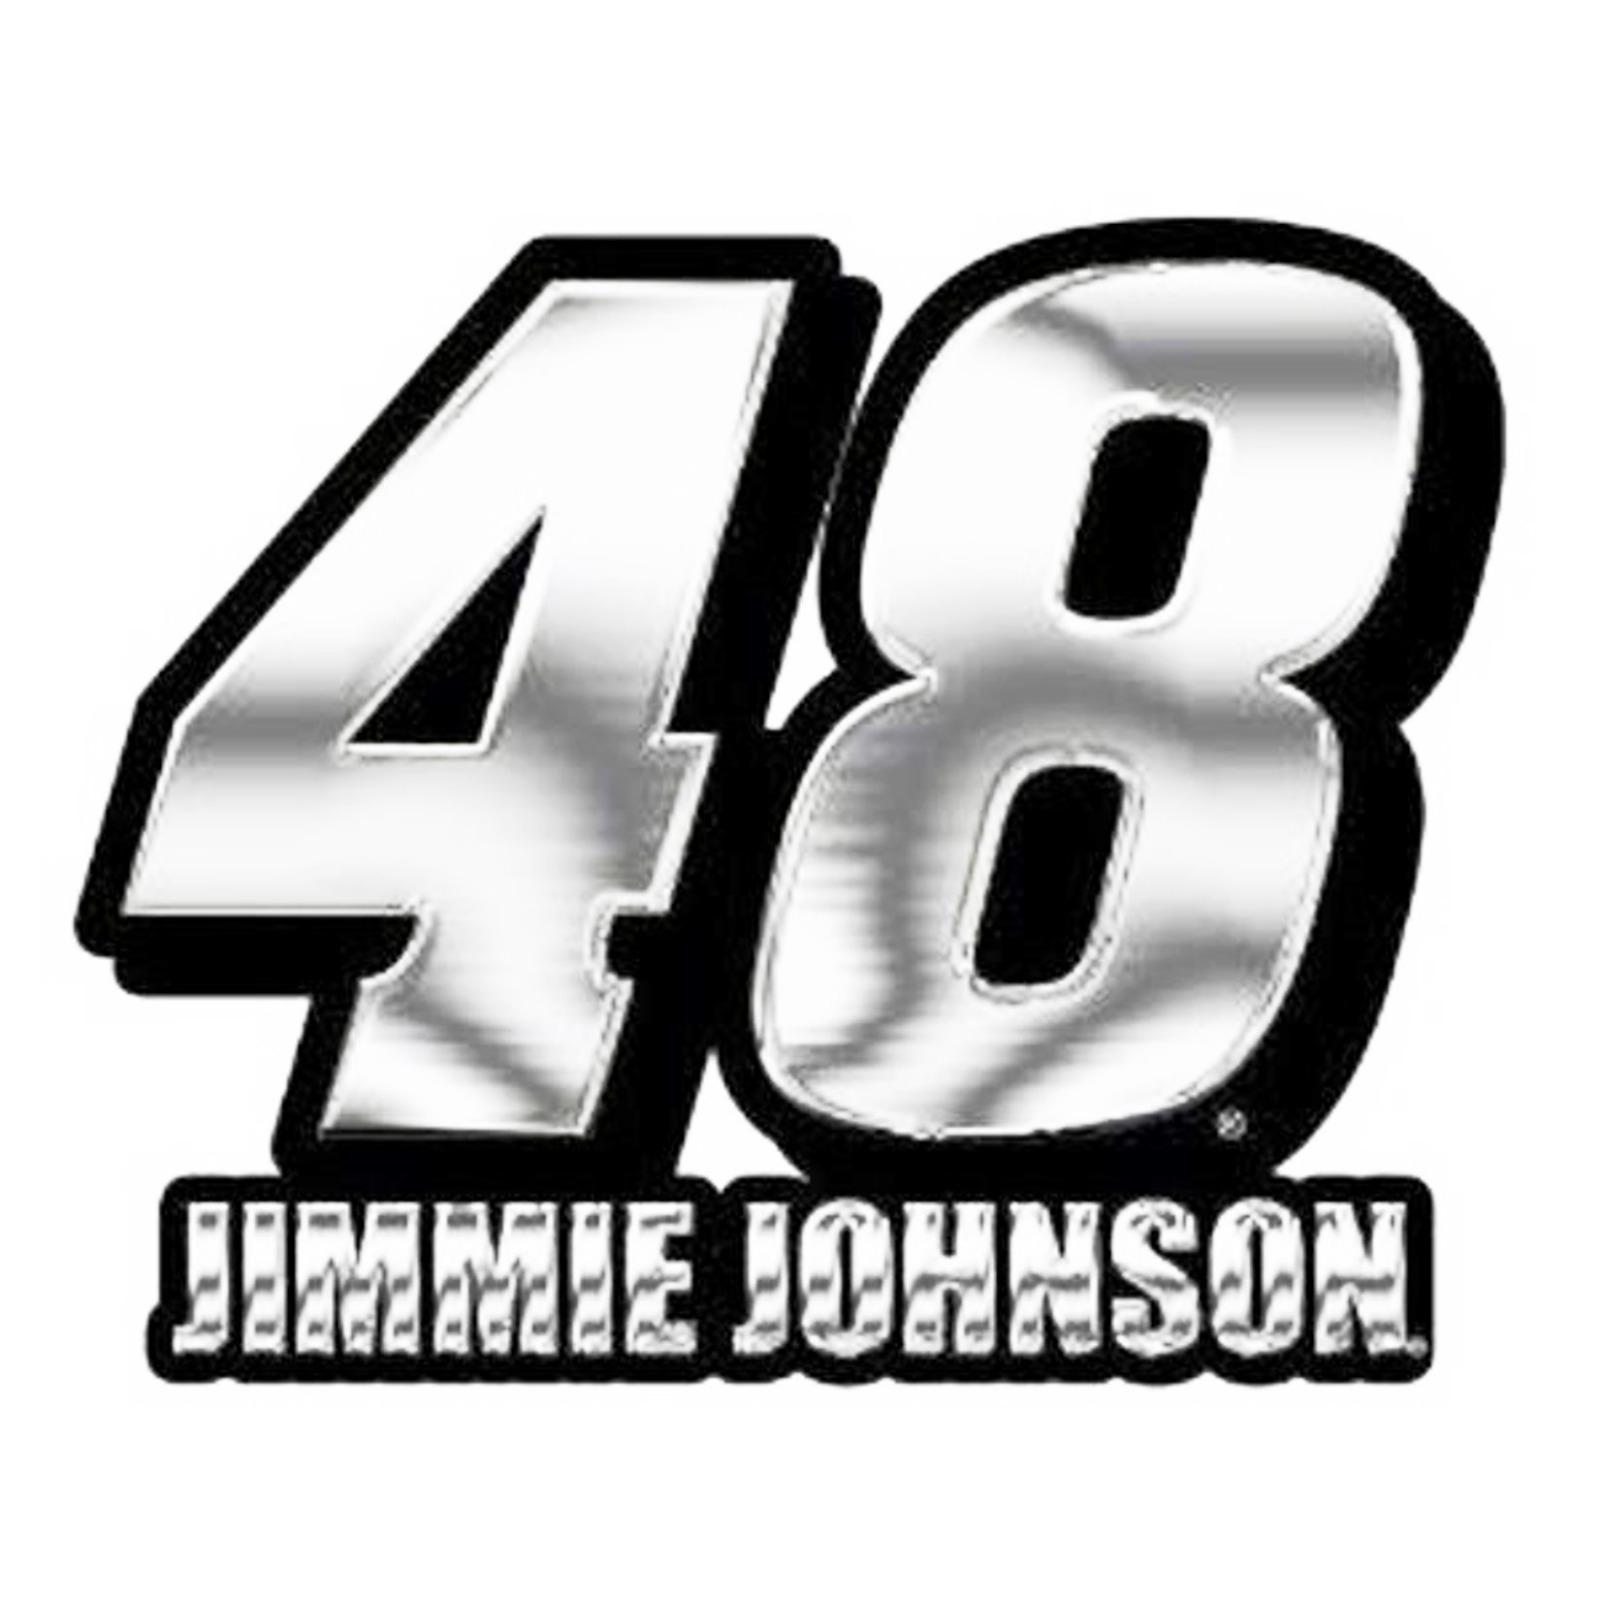 Details about Jimmie Johnson #48 CE Silver Chrome Color Auto Emblem Raised  Decal Nascar Racing.